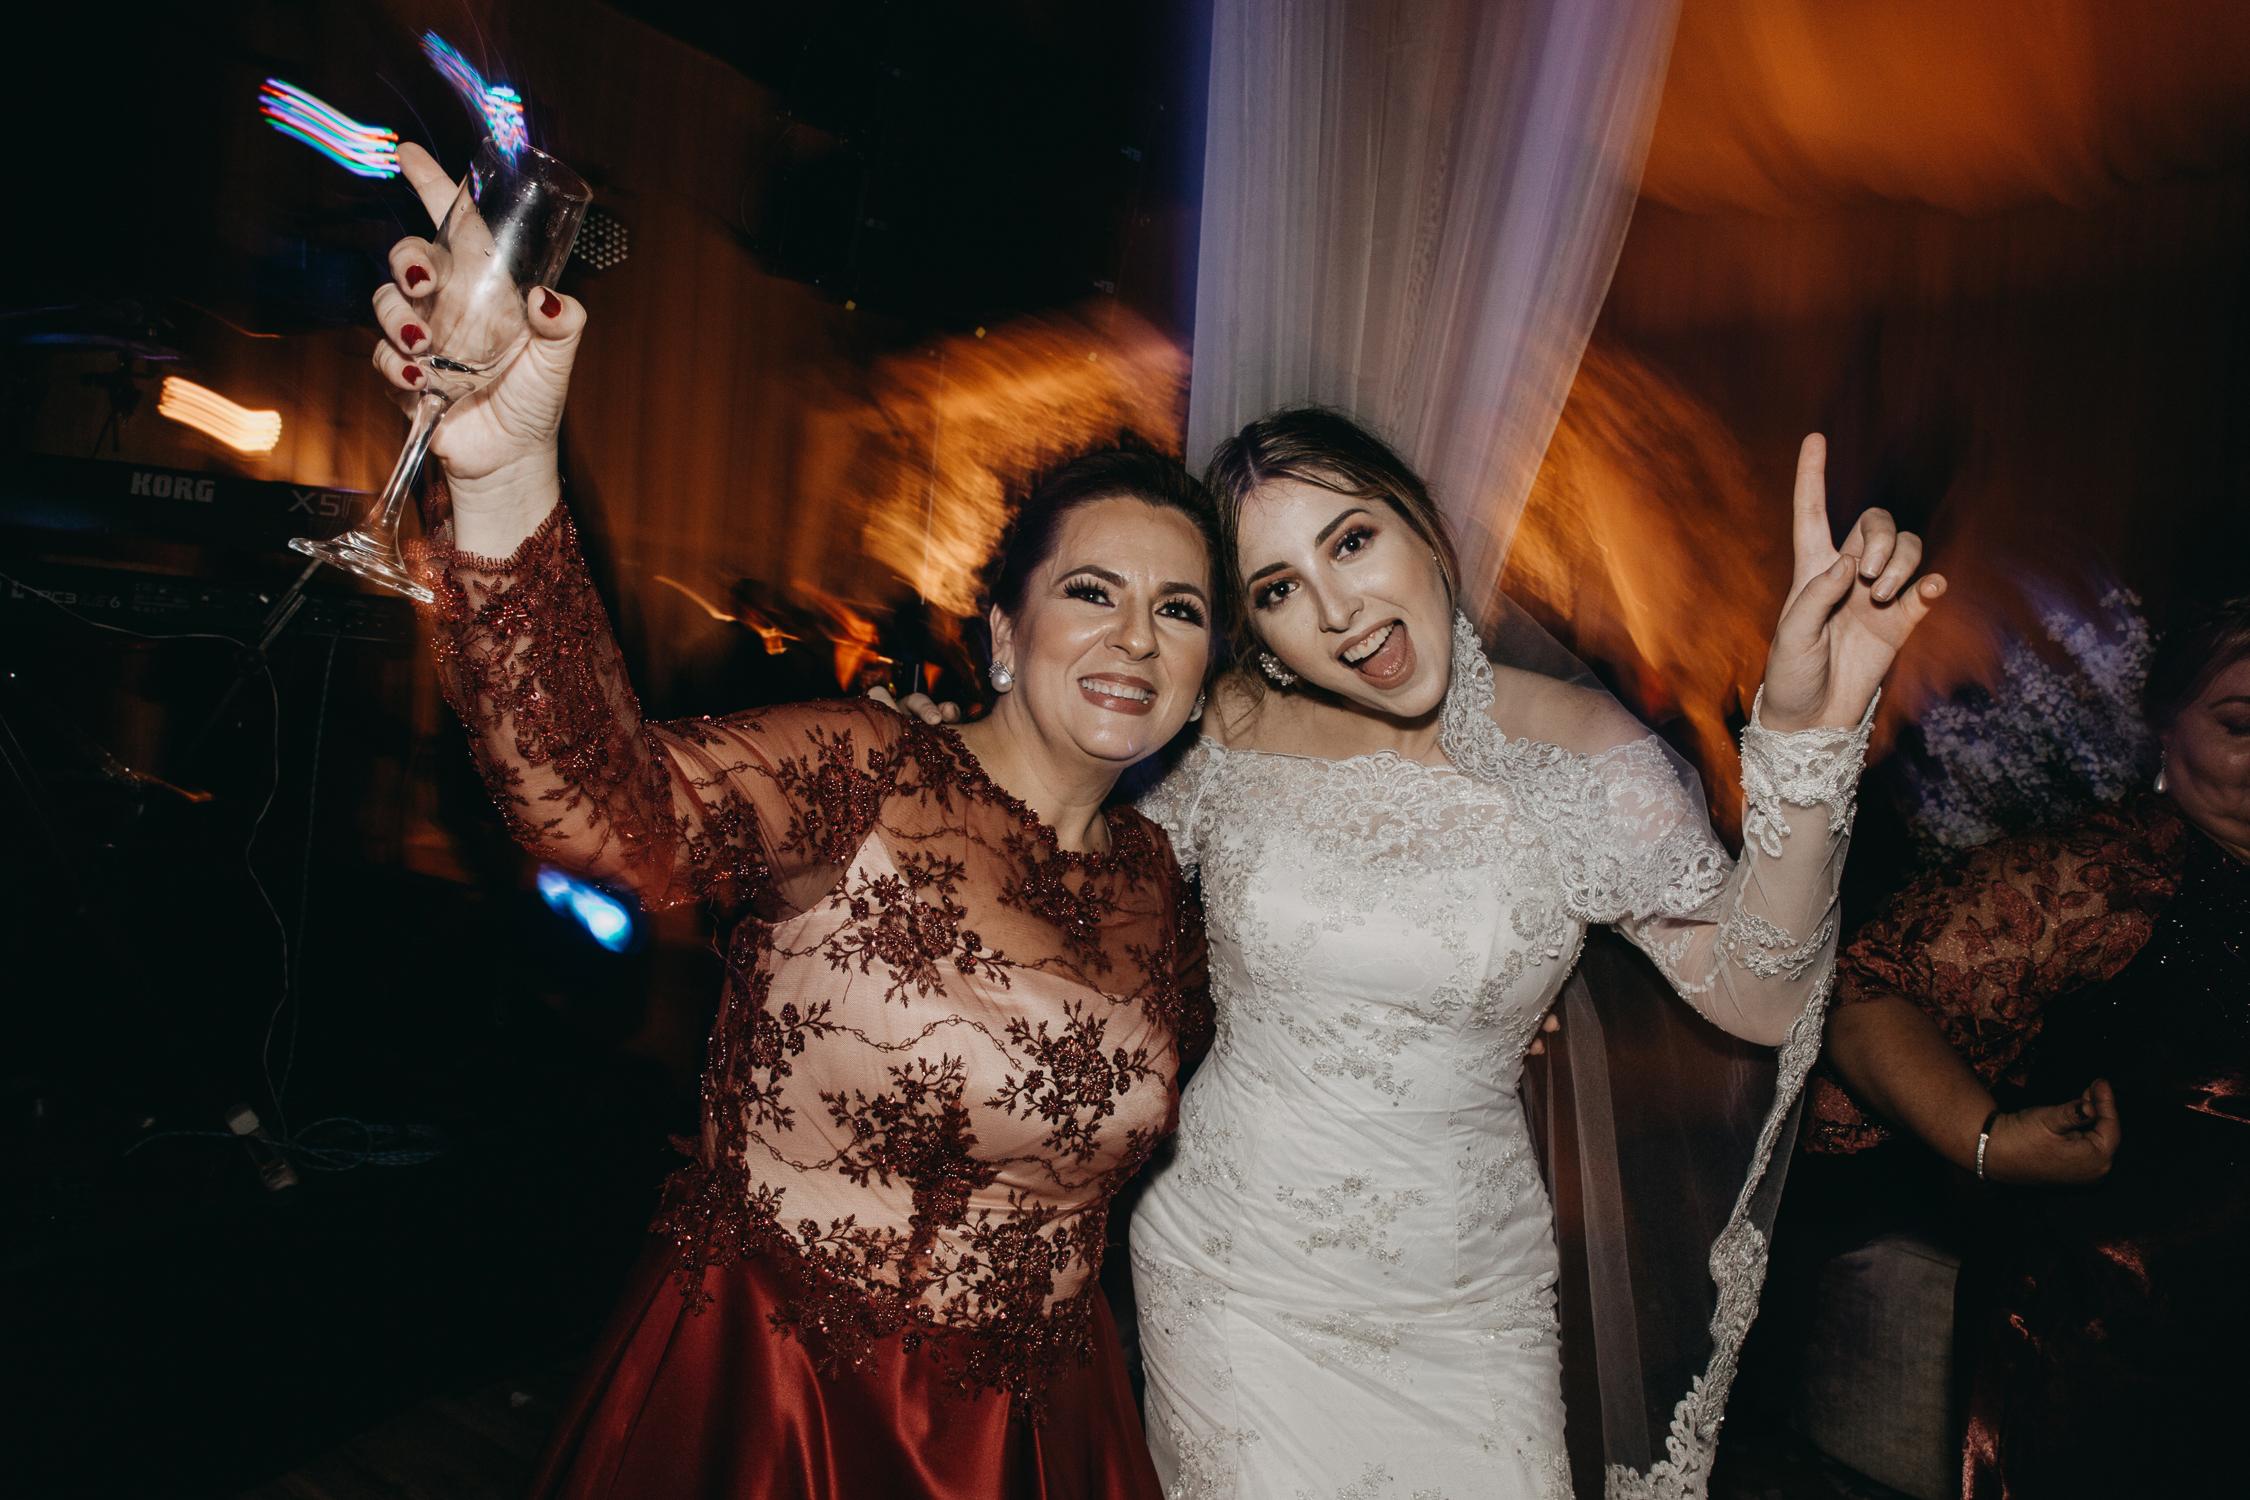 Michelle-Agurto-Fotografia-Bodas-Ecuador-Destination-Wedding-Photographer-Vicky-Javier-218.JPG